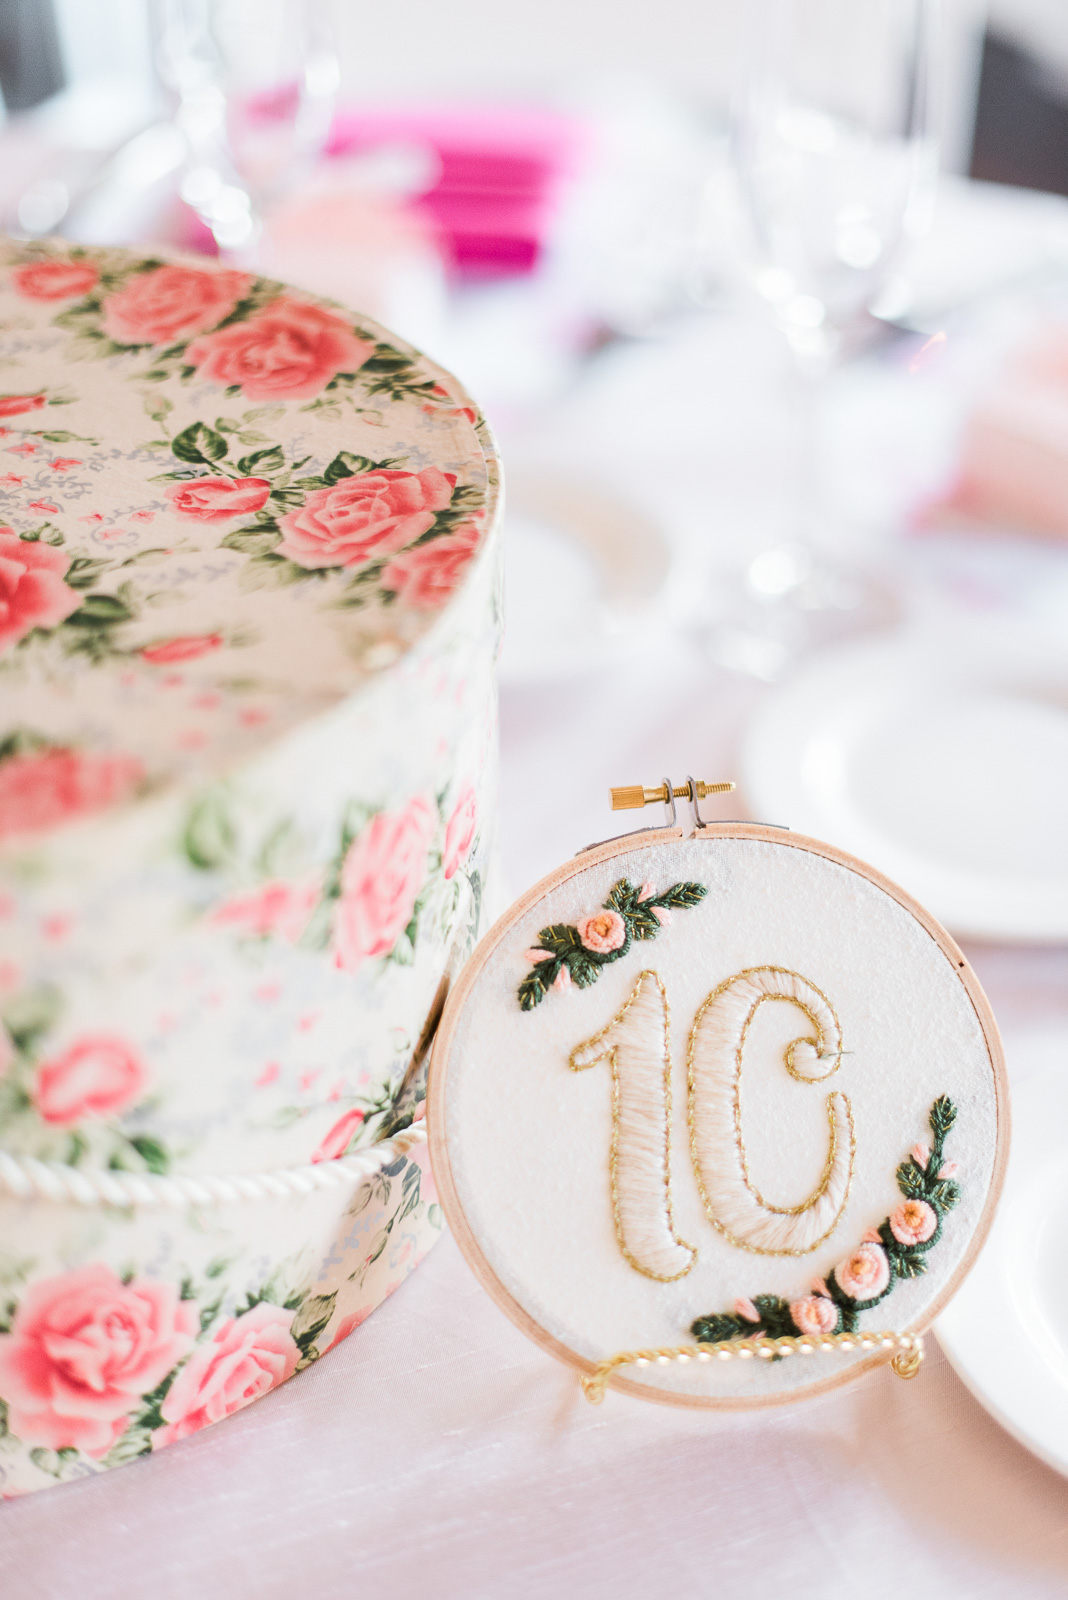 Fun + Creative Embroidery Hoop Table Numbers for Weddings